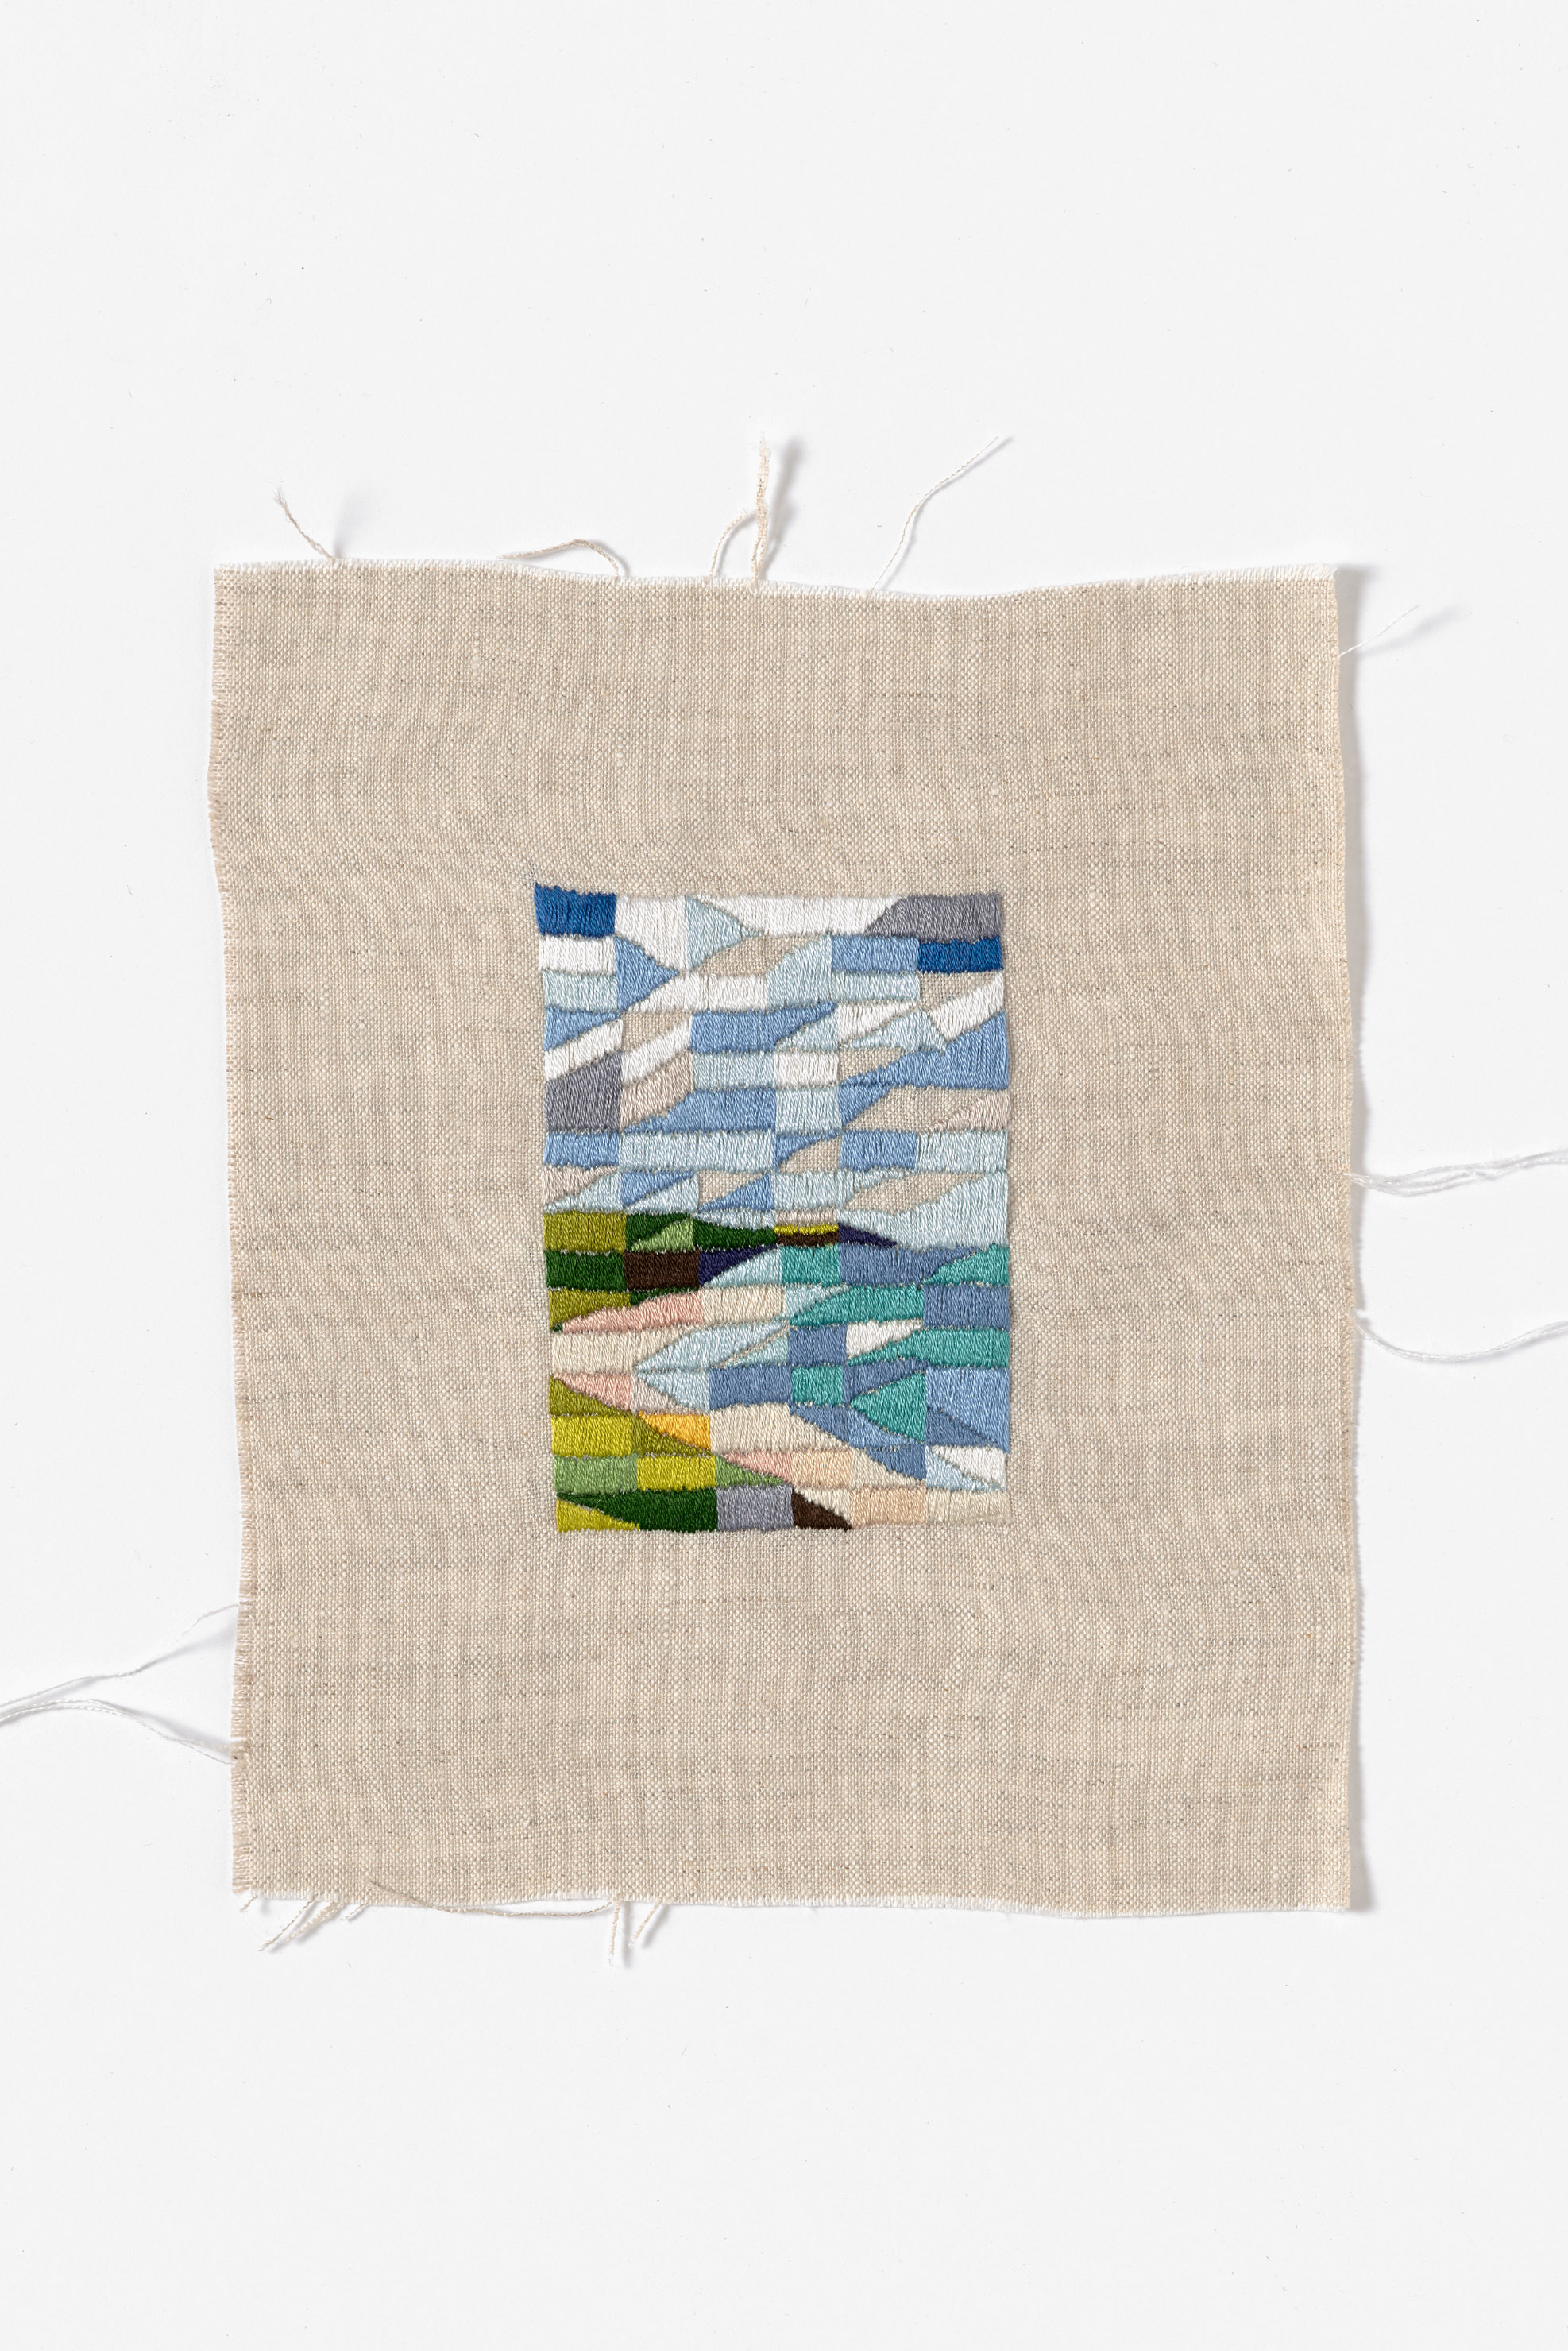 Looking North, Venus Bay  2015 Cotton thread on linen 21 x 27cm